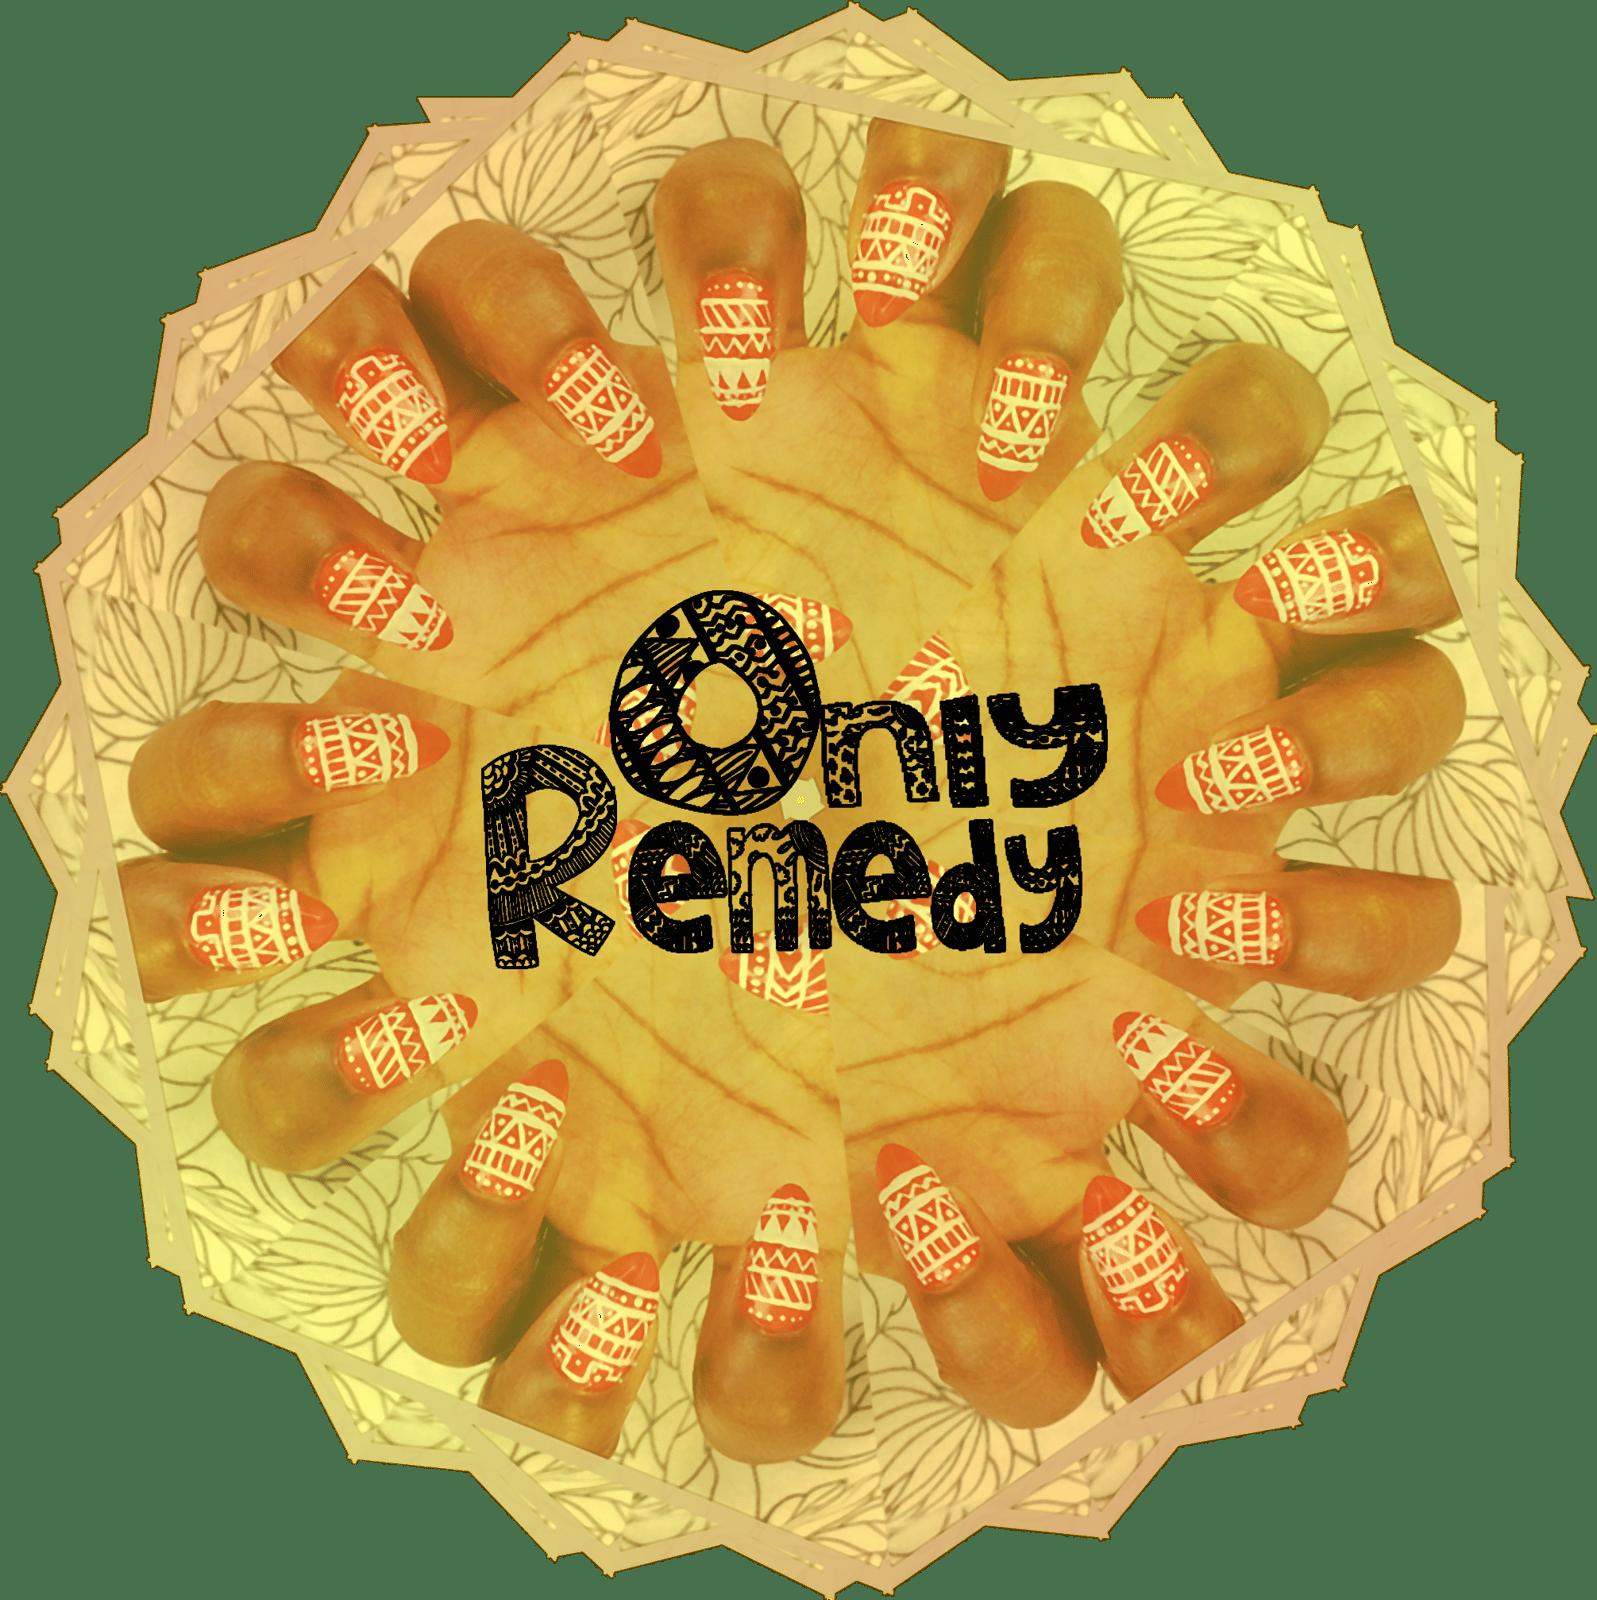 OnlyRemedy nails